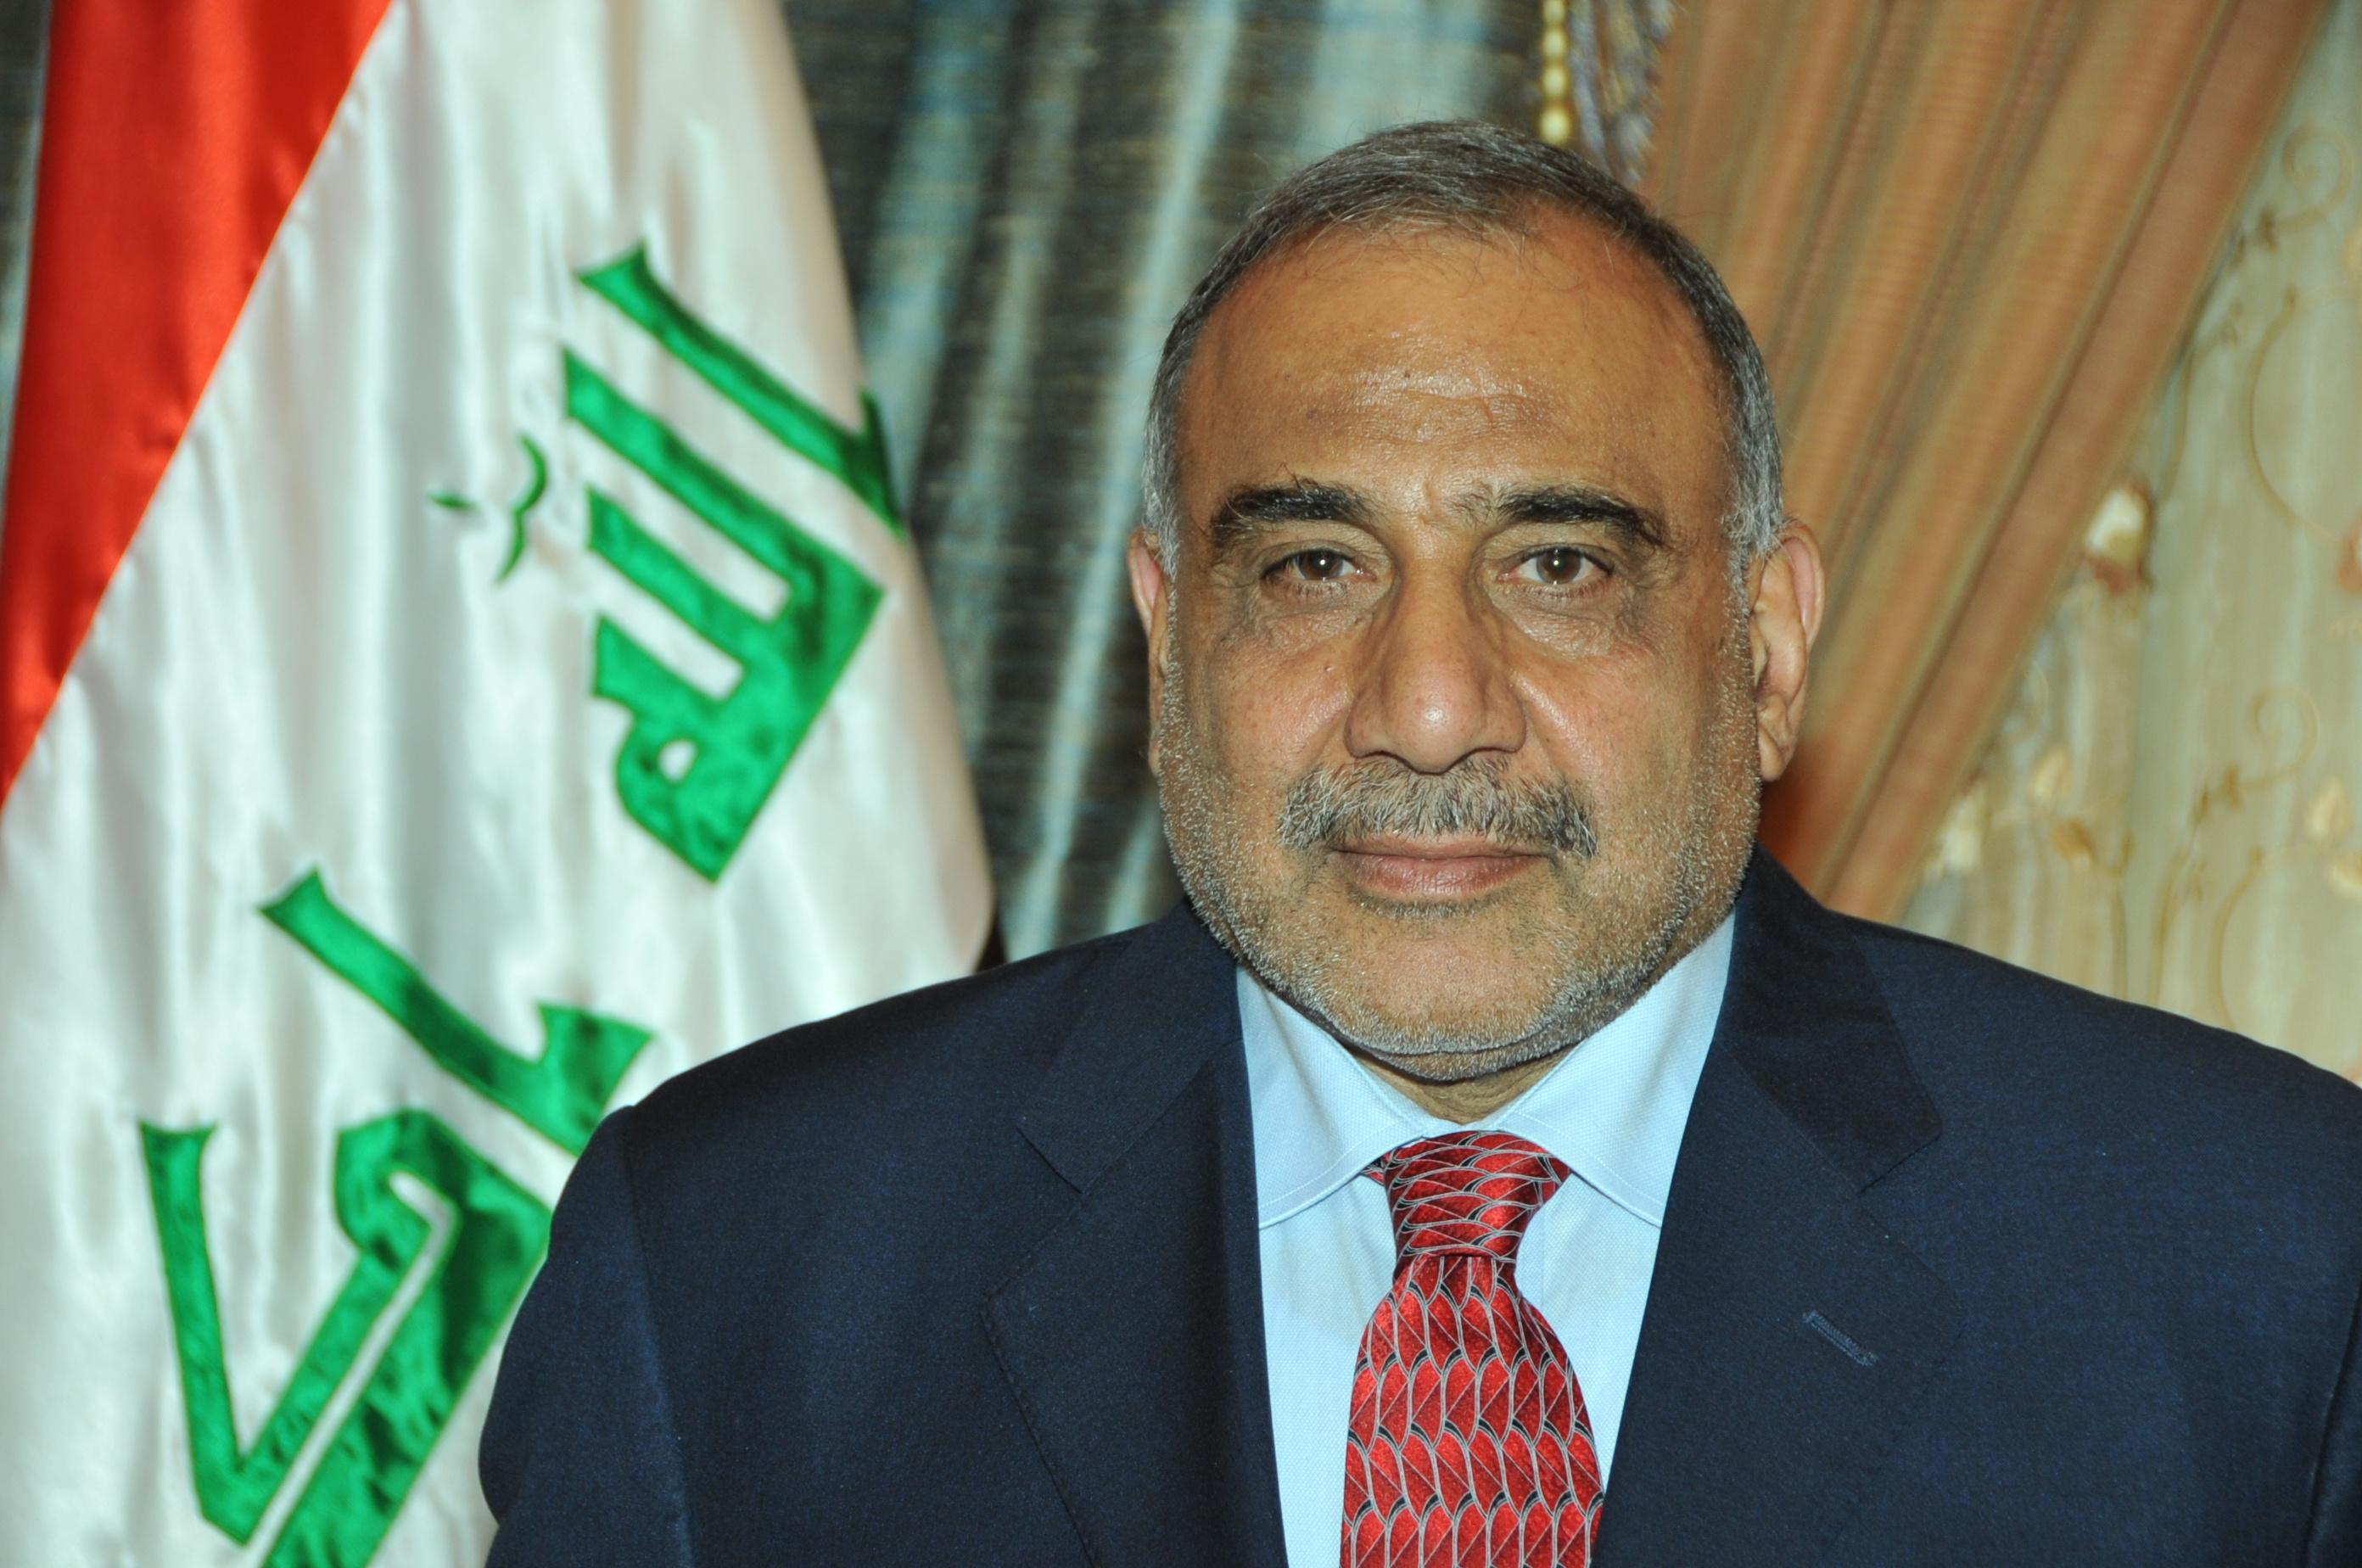 Iraqi Prime Minister announces resignation after violent protests